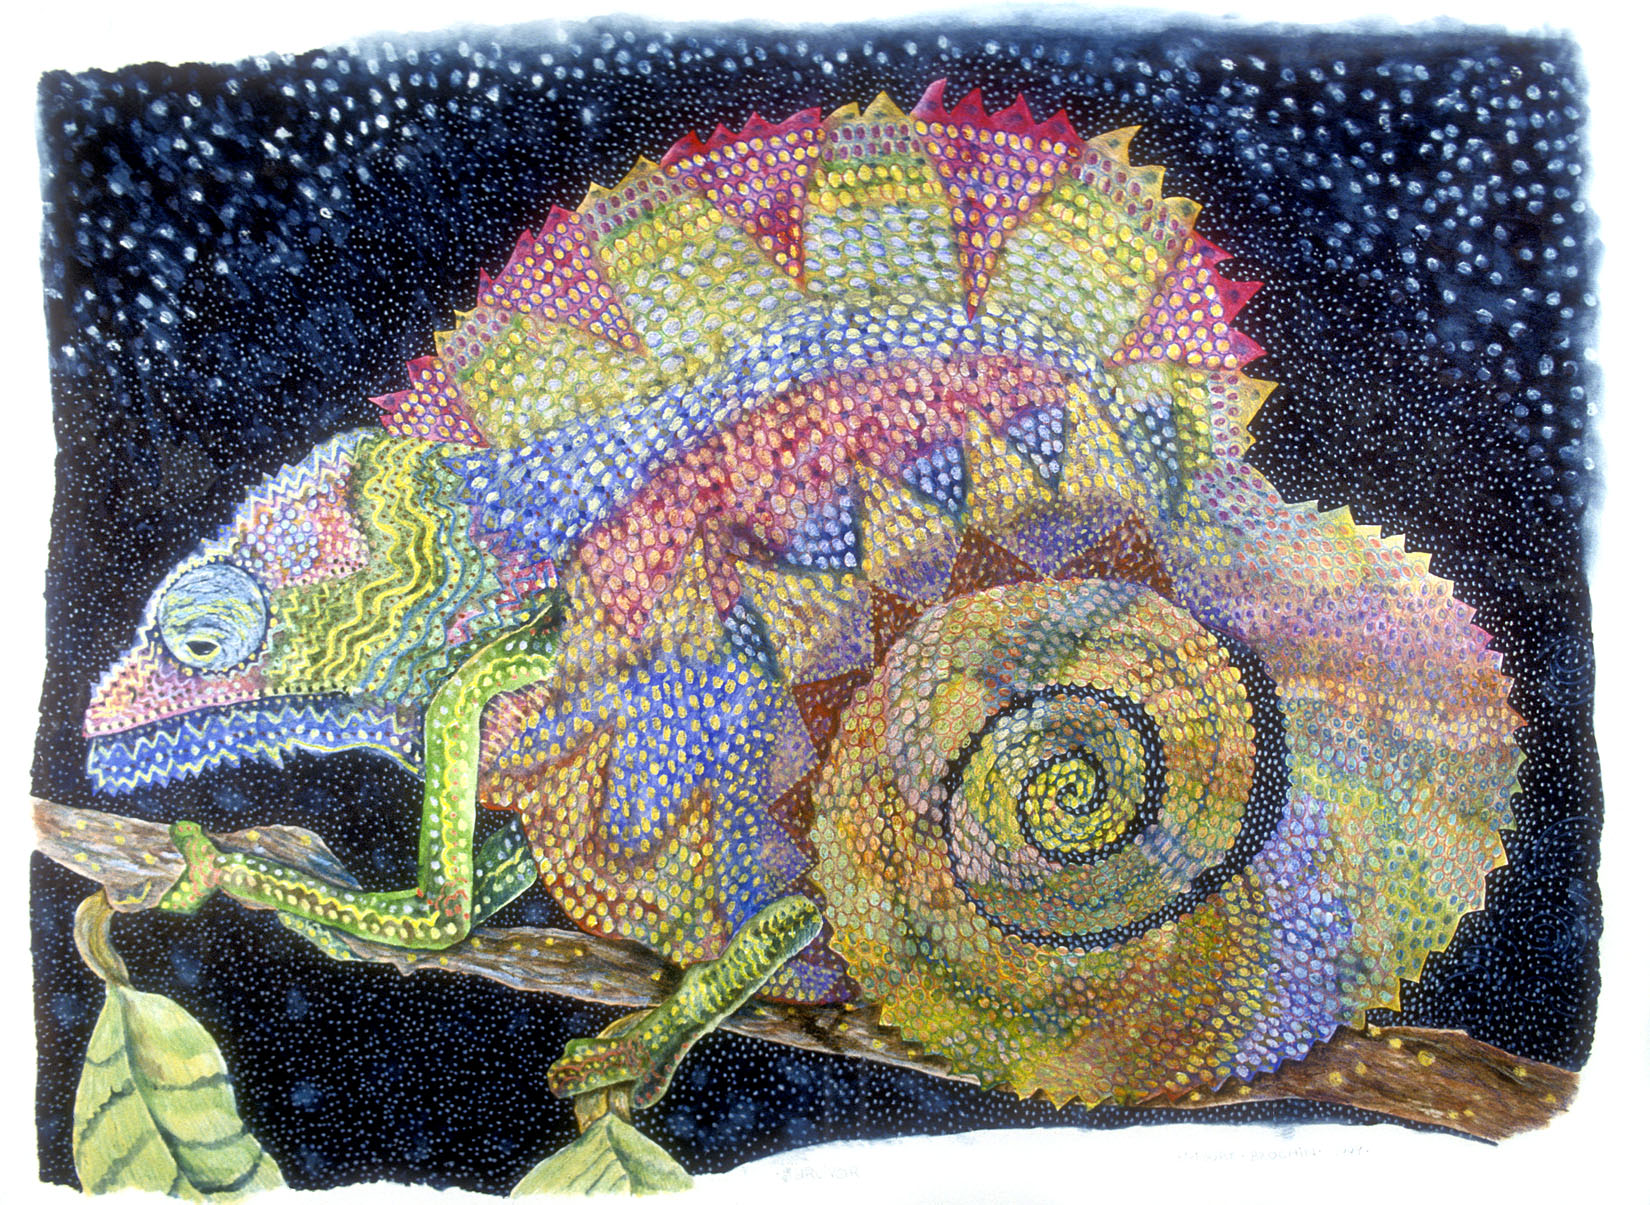 Passion (chameleon)